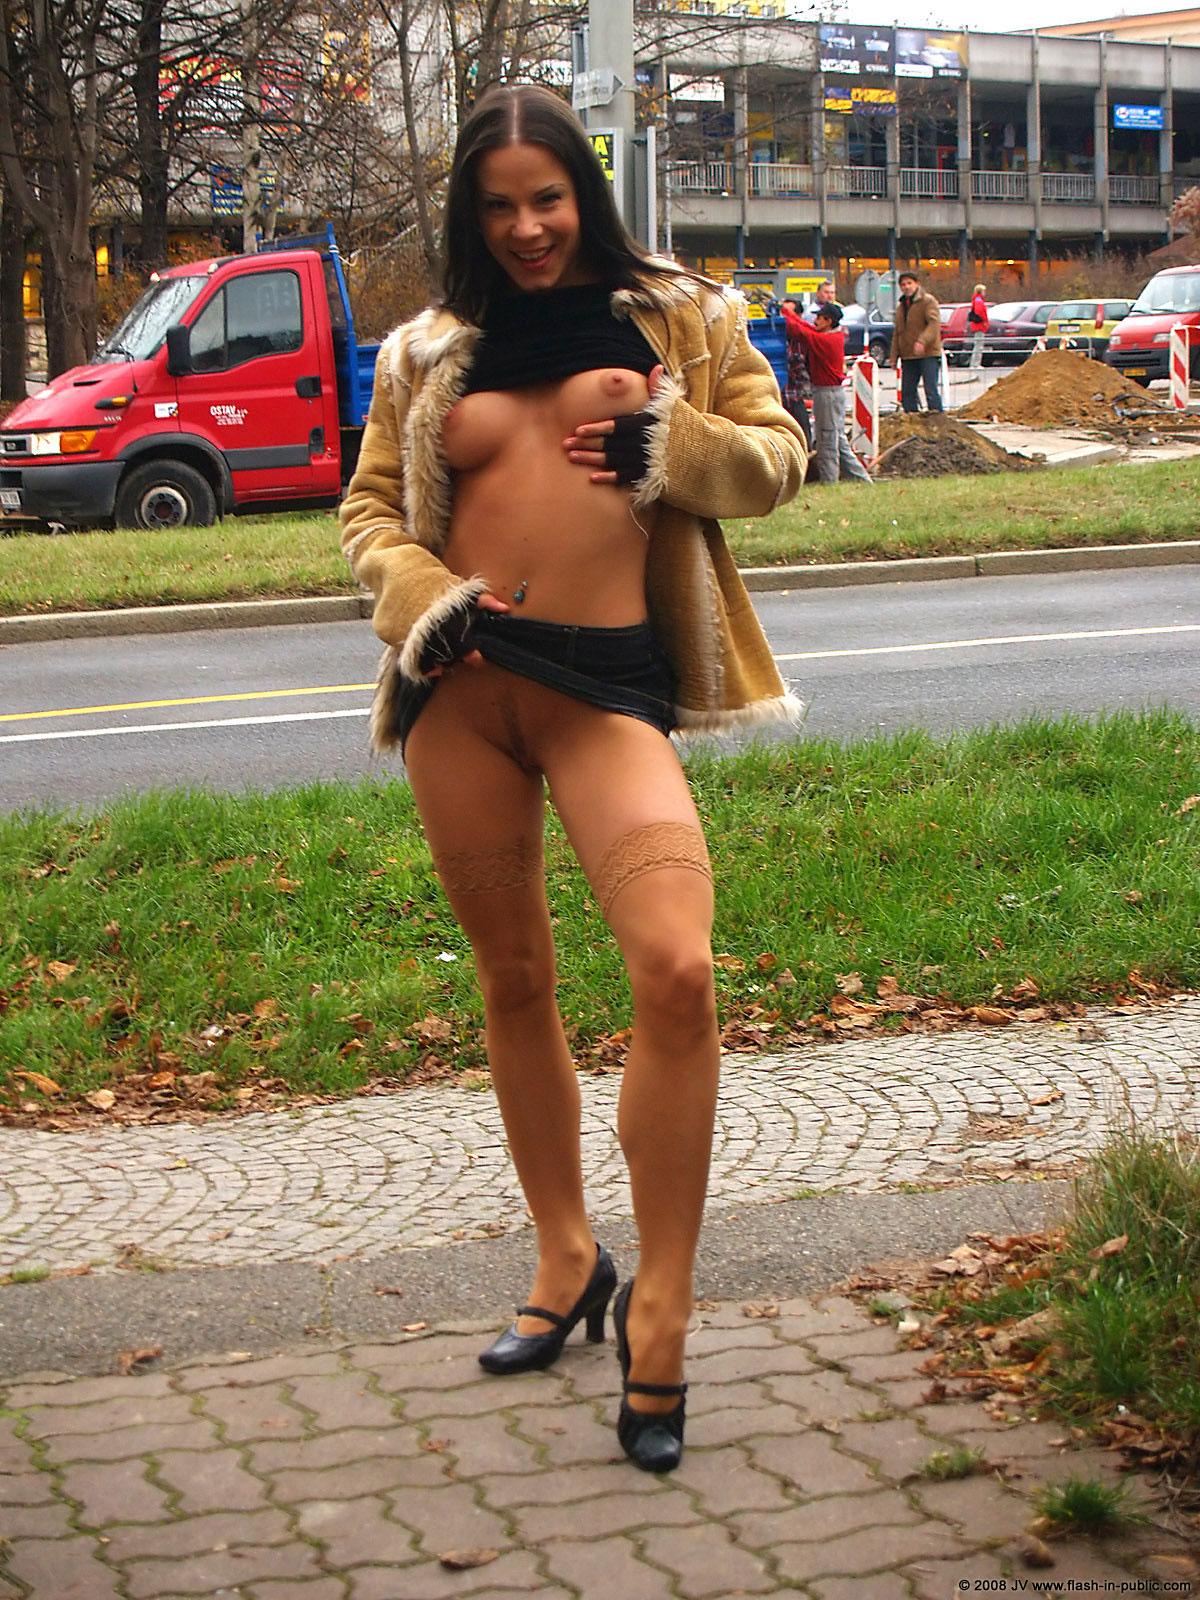 alexandra-g-bottomless-stockings-flash-in-public-16